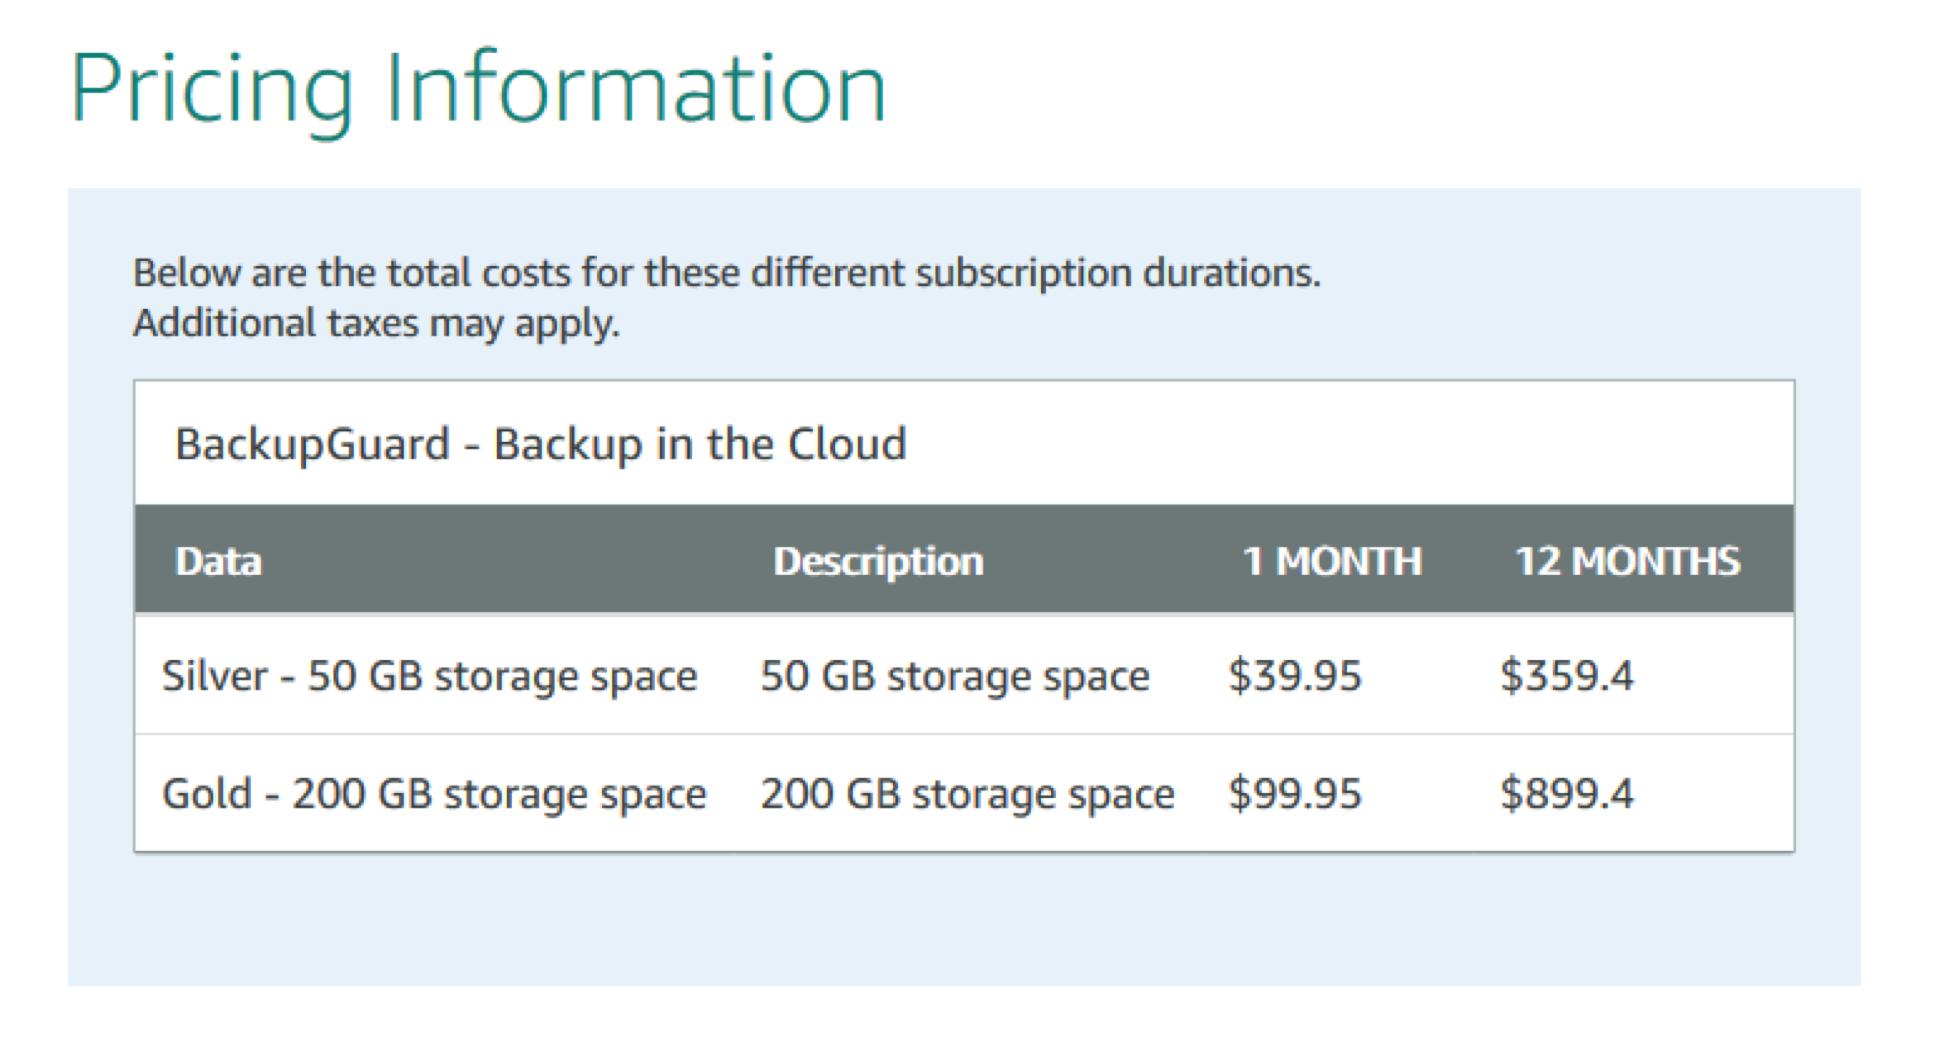 BackupGuard SaaS service AWS marketplace pricing information